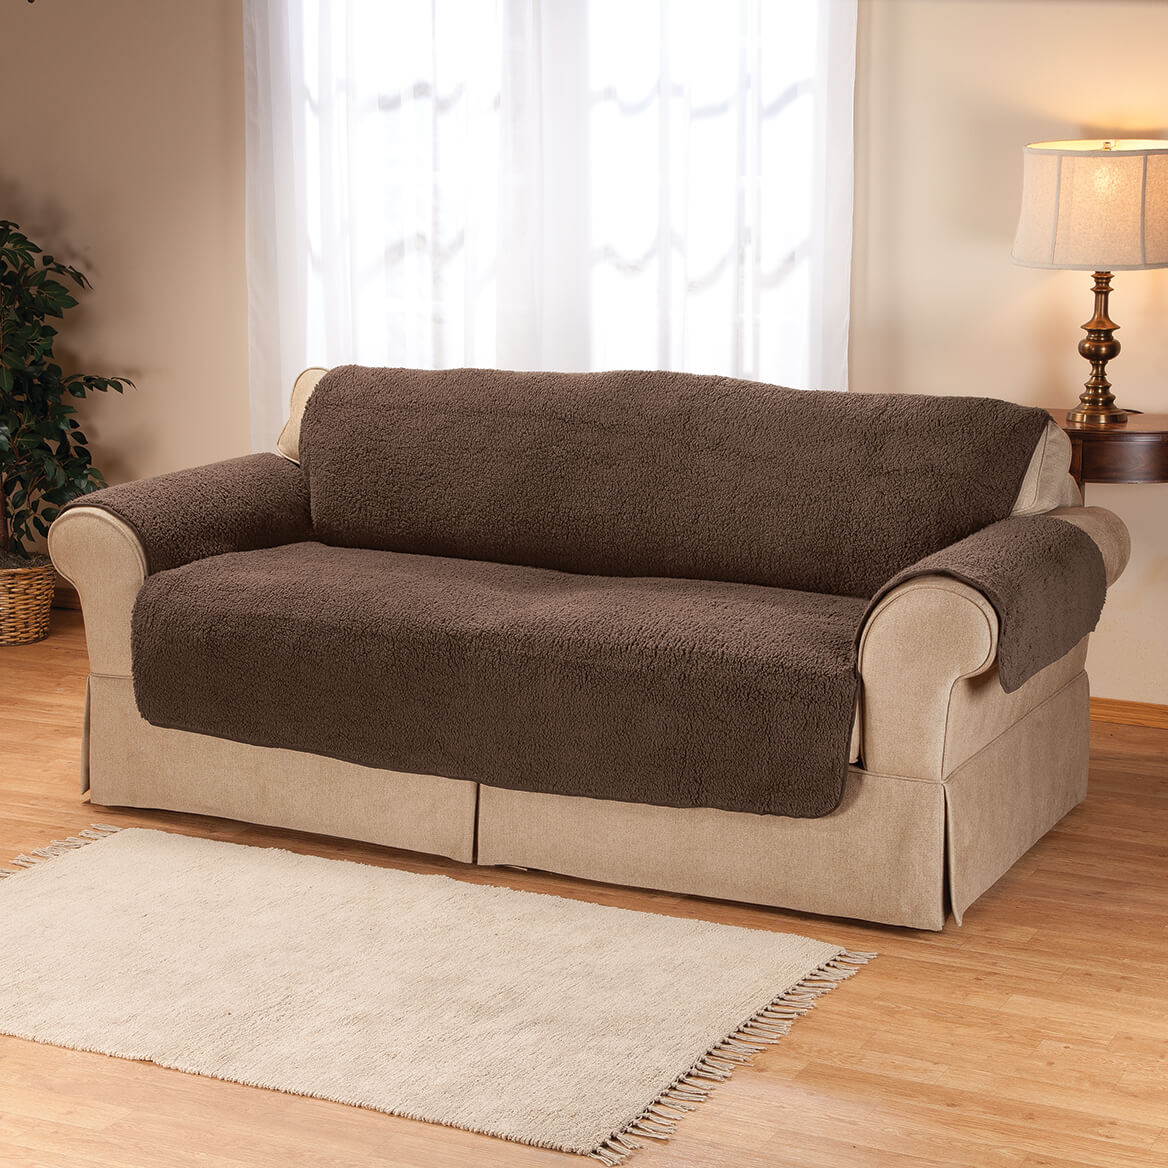 Furniture Covers - Furniture Protectors - Chair Pads - Walter Drake